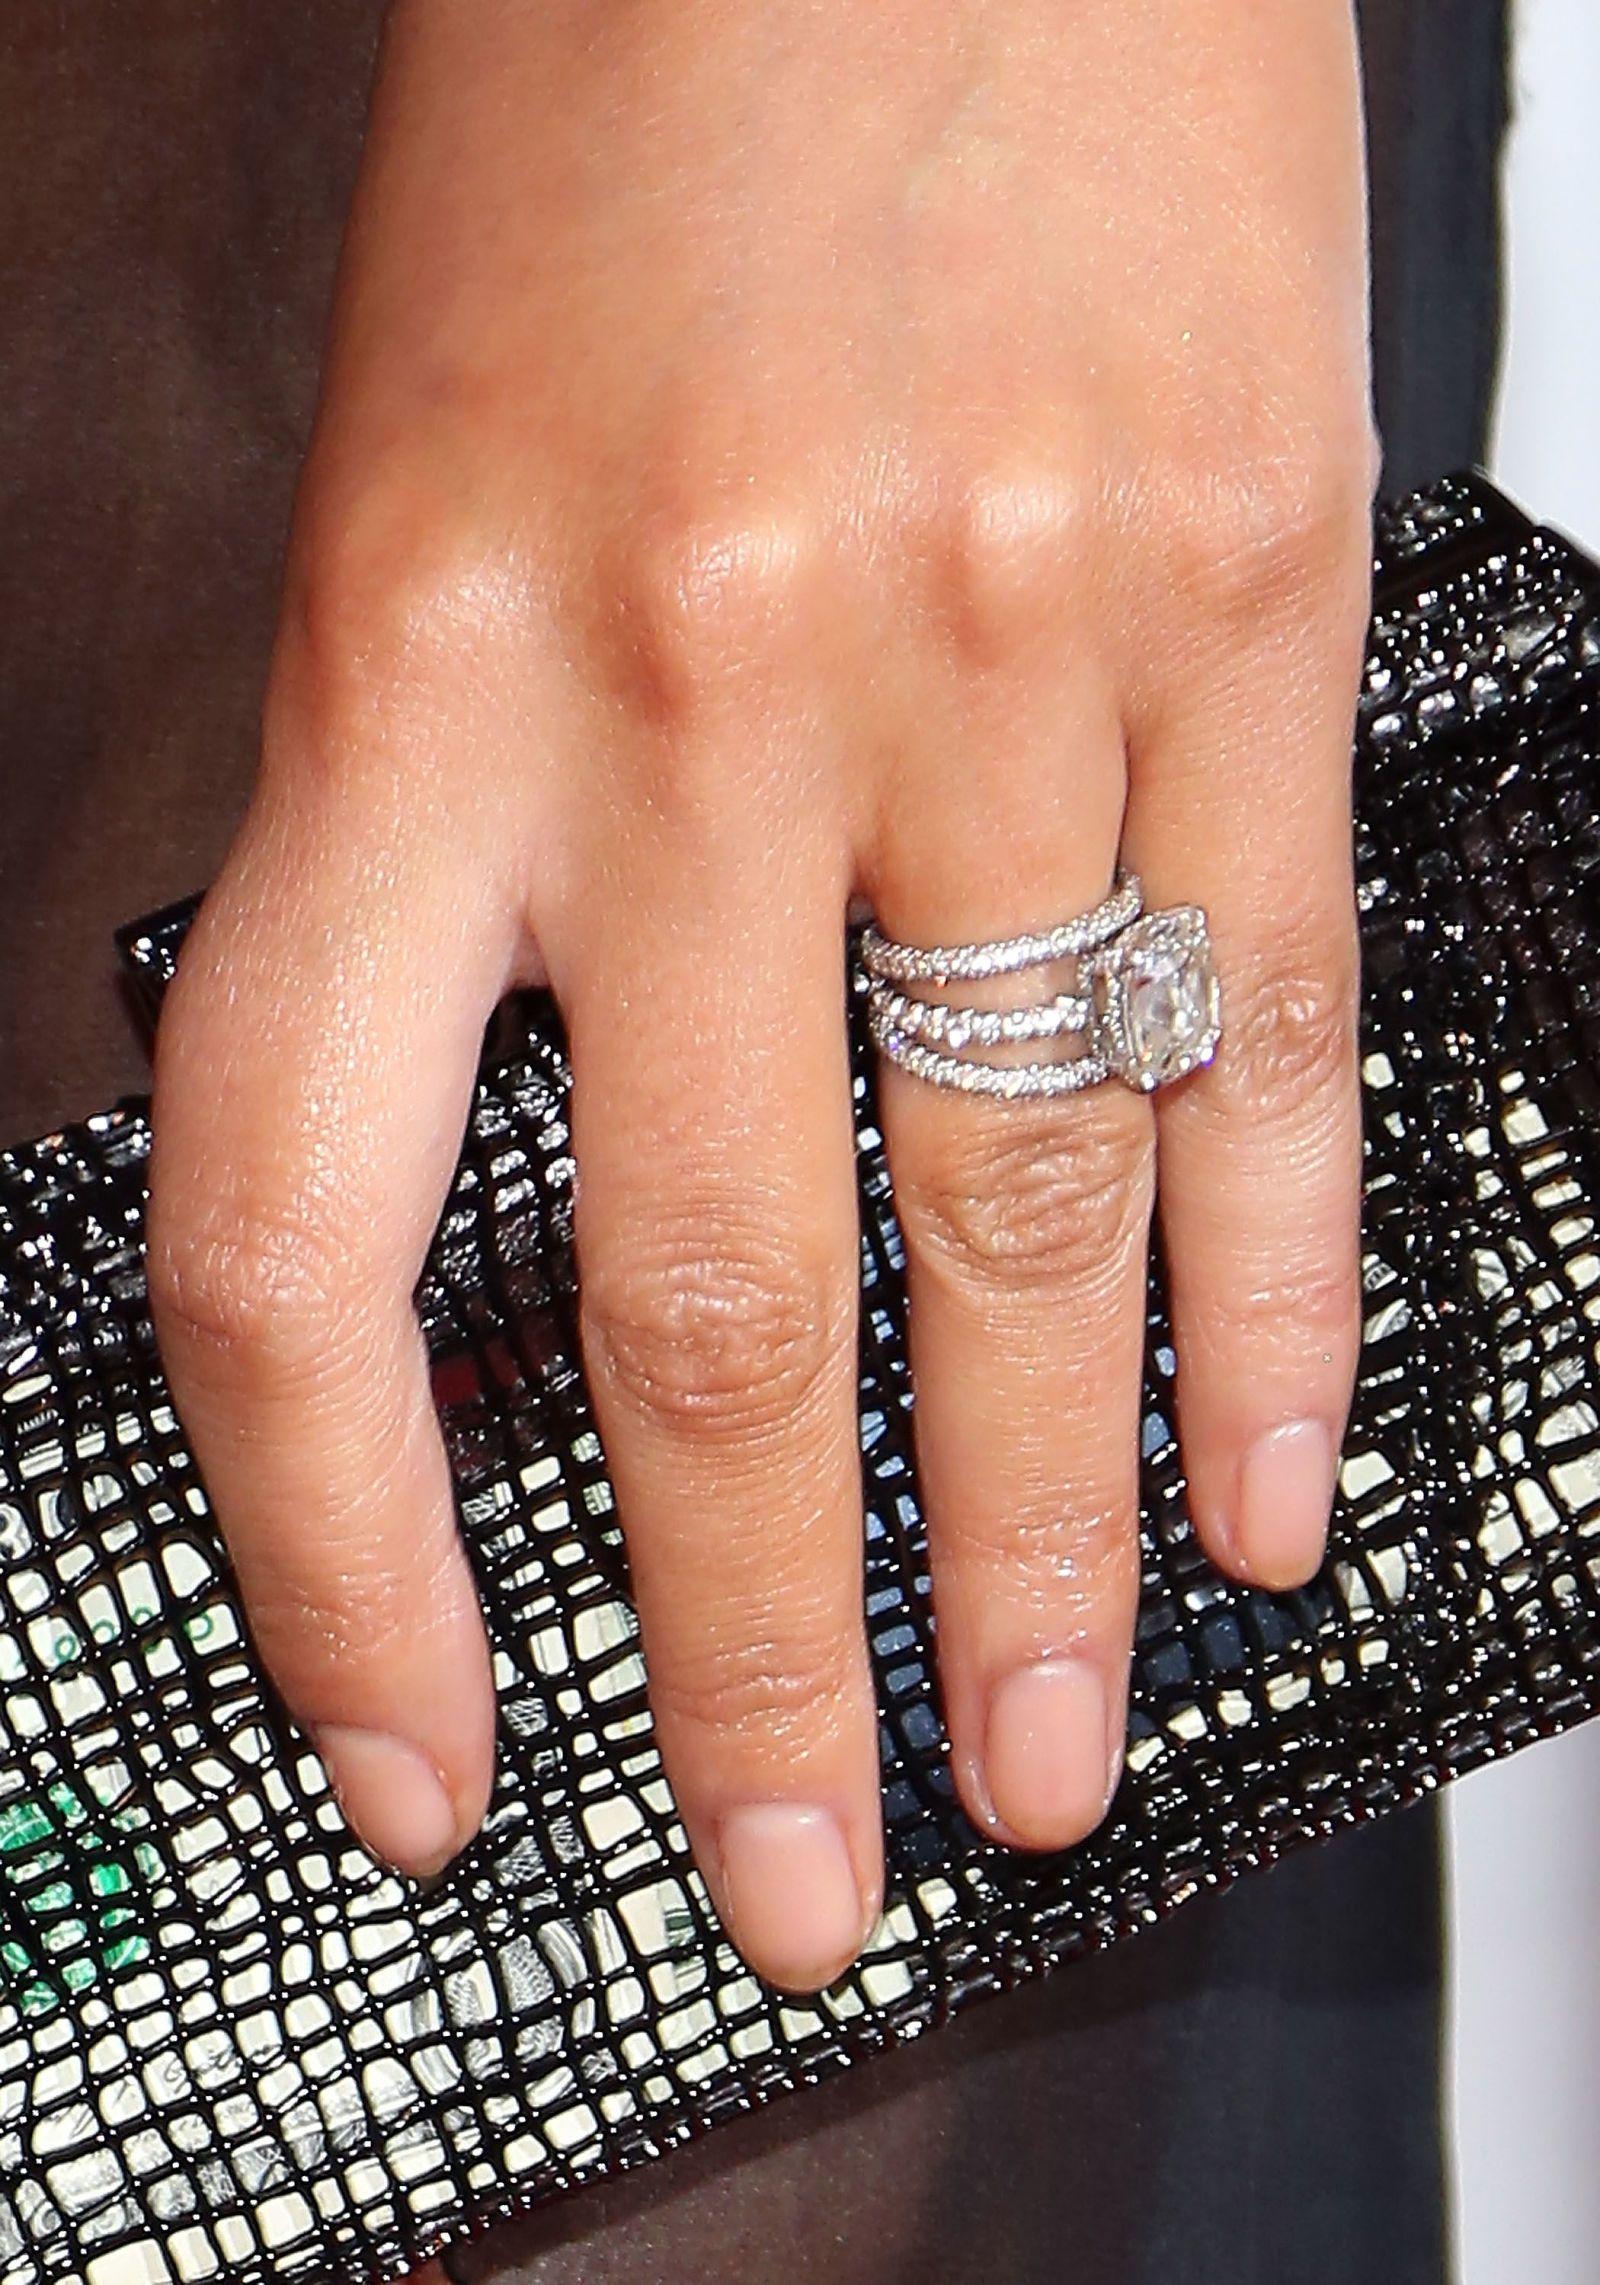 Chrissy Teigen And John Legend The Ring: Rachel Zoe Wedding Band At Websimilar.org